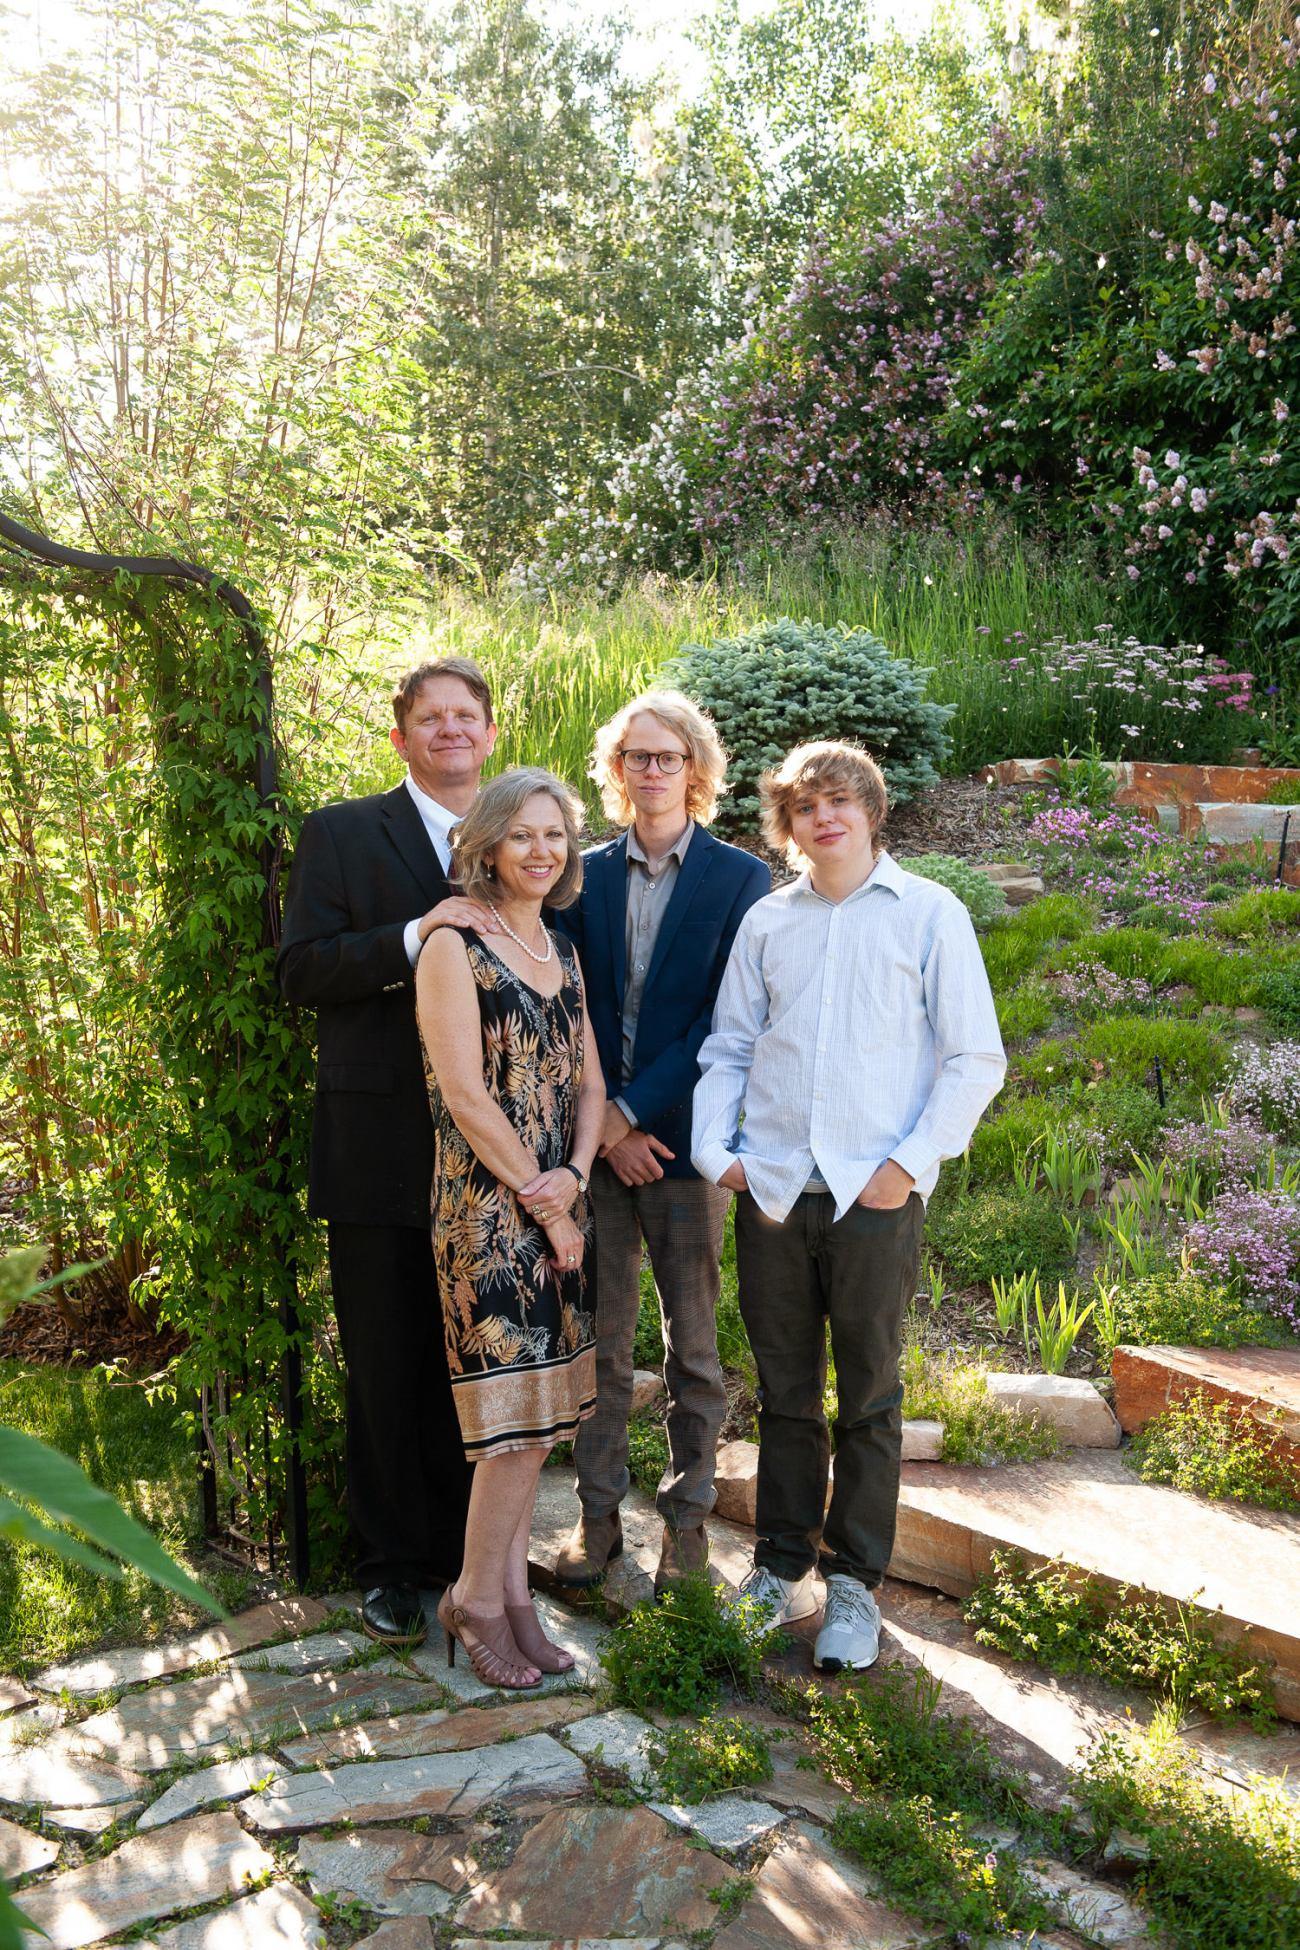 Calgary grad celebrates with his family captured by Calgary photographer Tara Whittaker